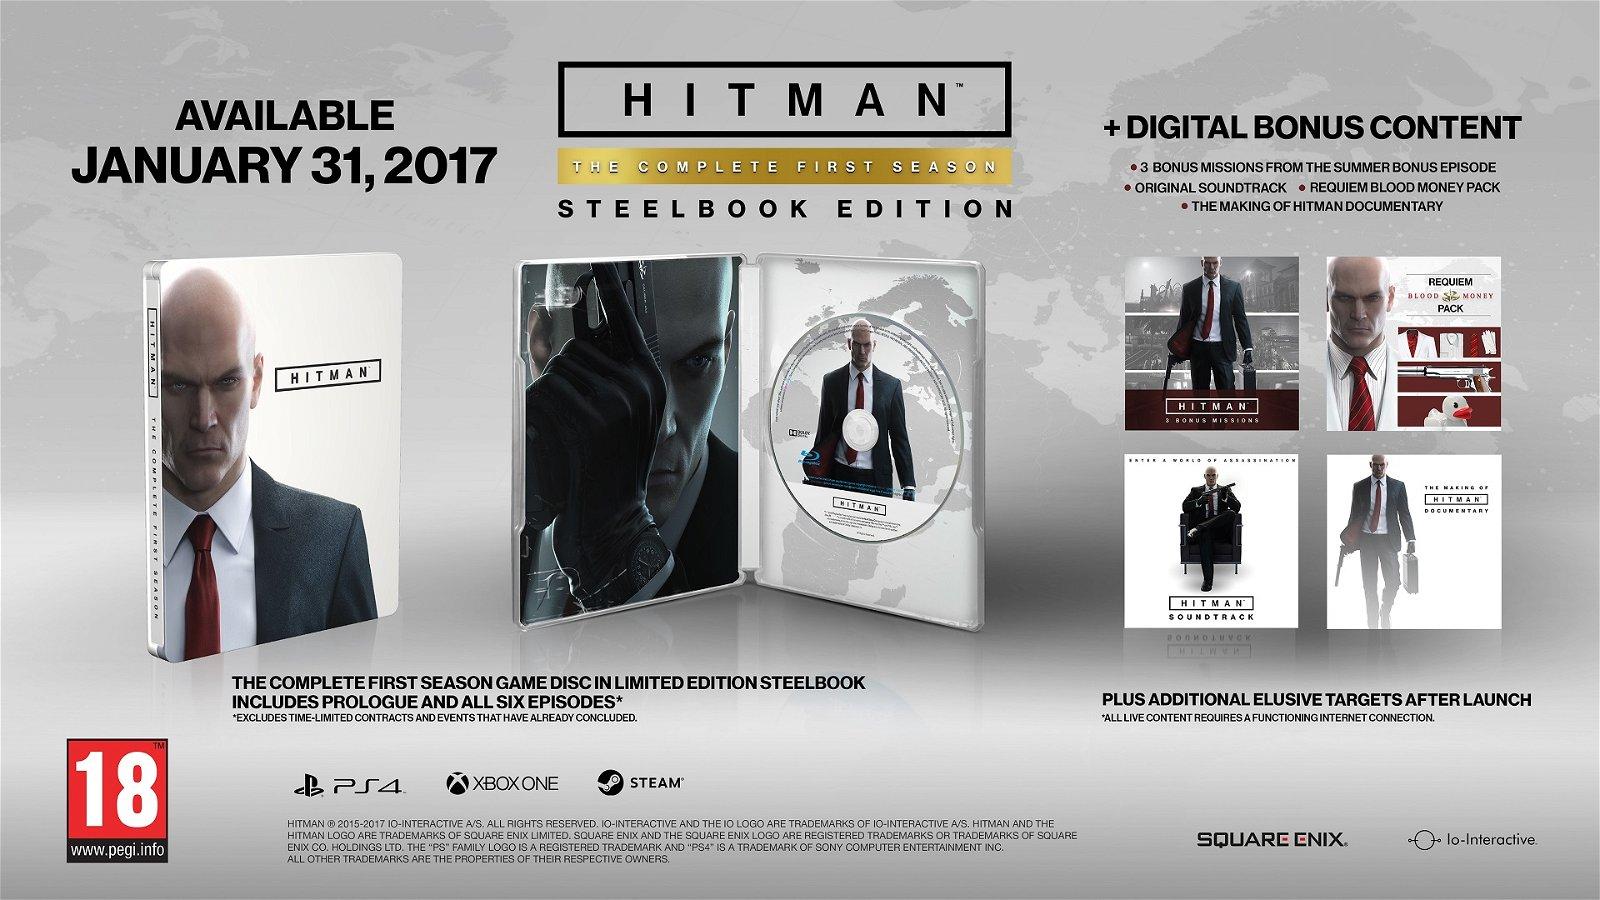 Hitman's Full Season Coming to Retail in January